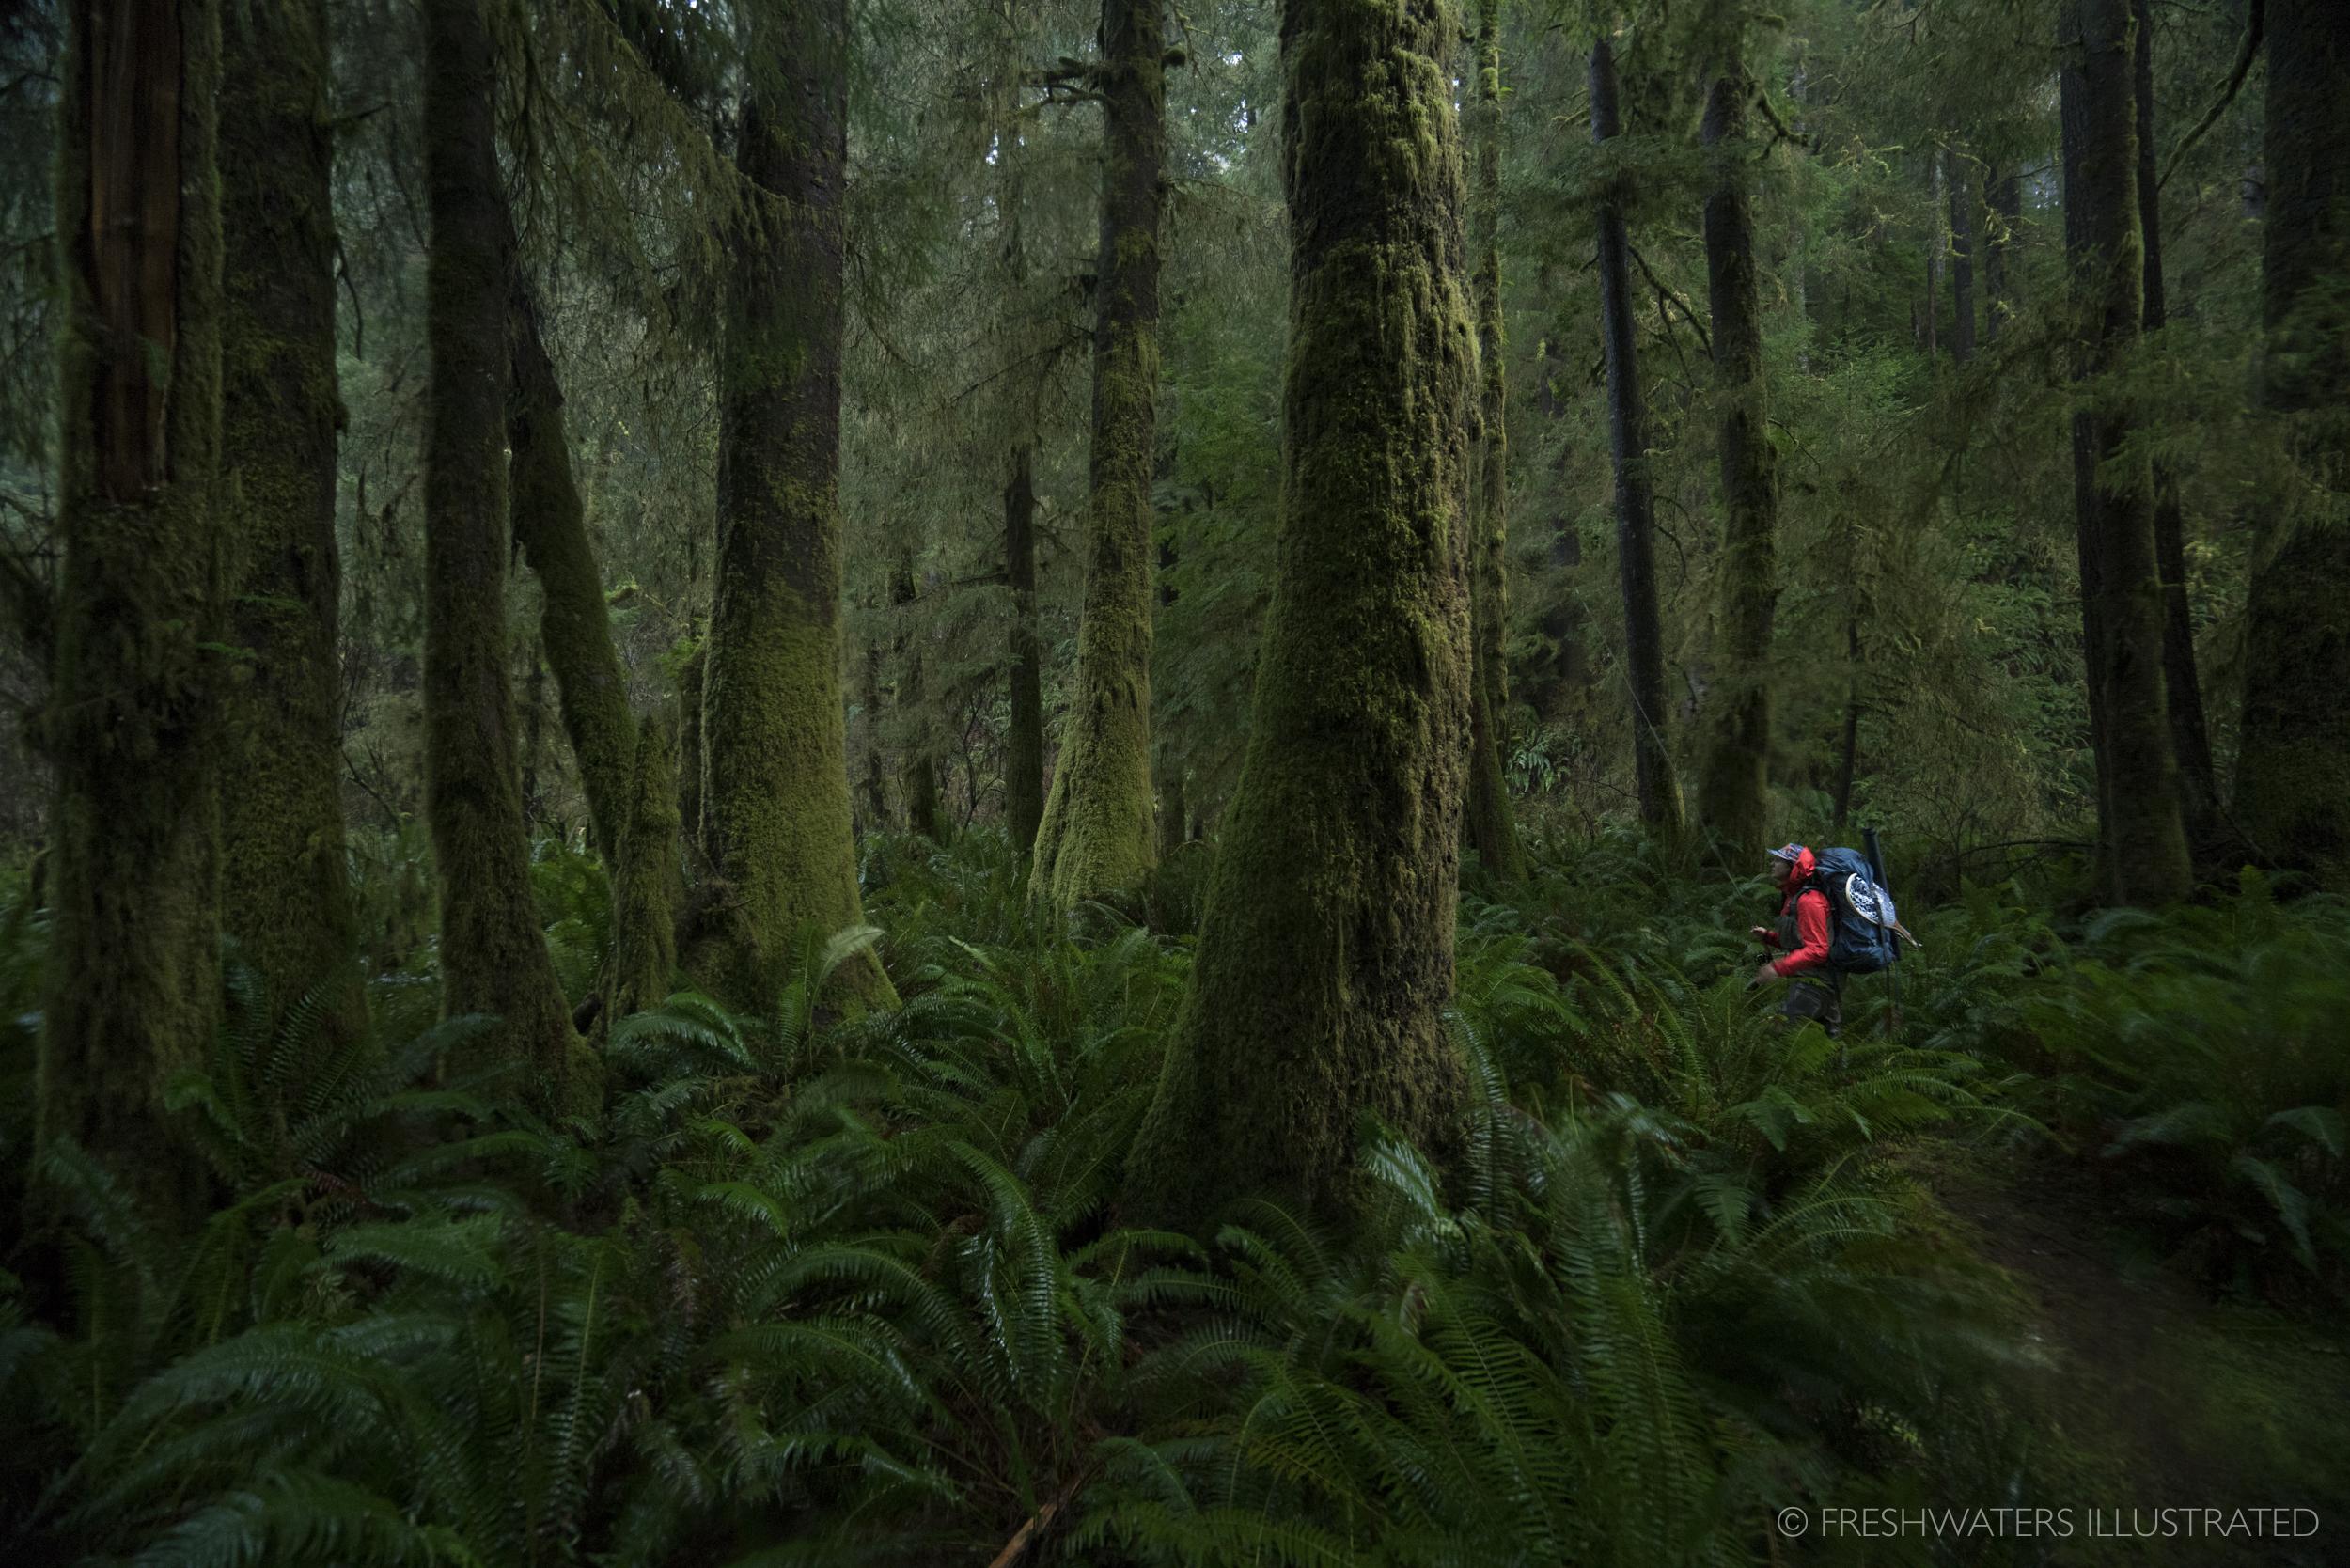 Backpacking in Oregon's old growth. Cummins Creek, Oregon